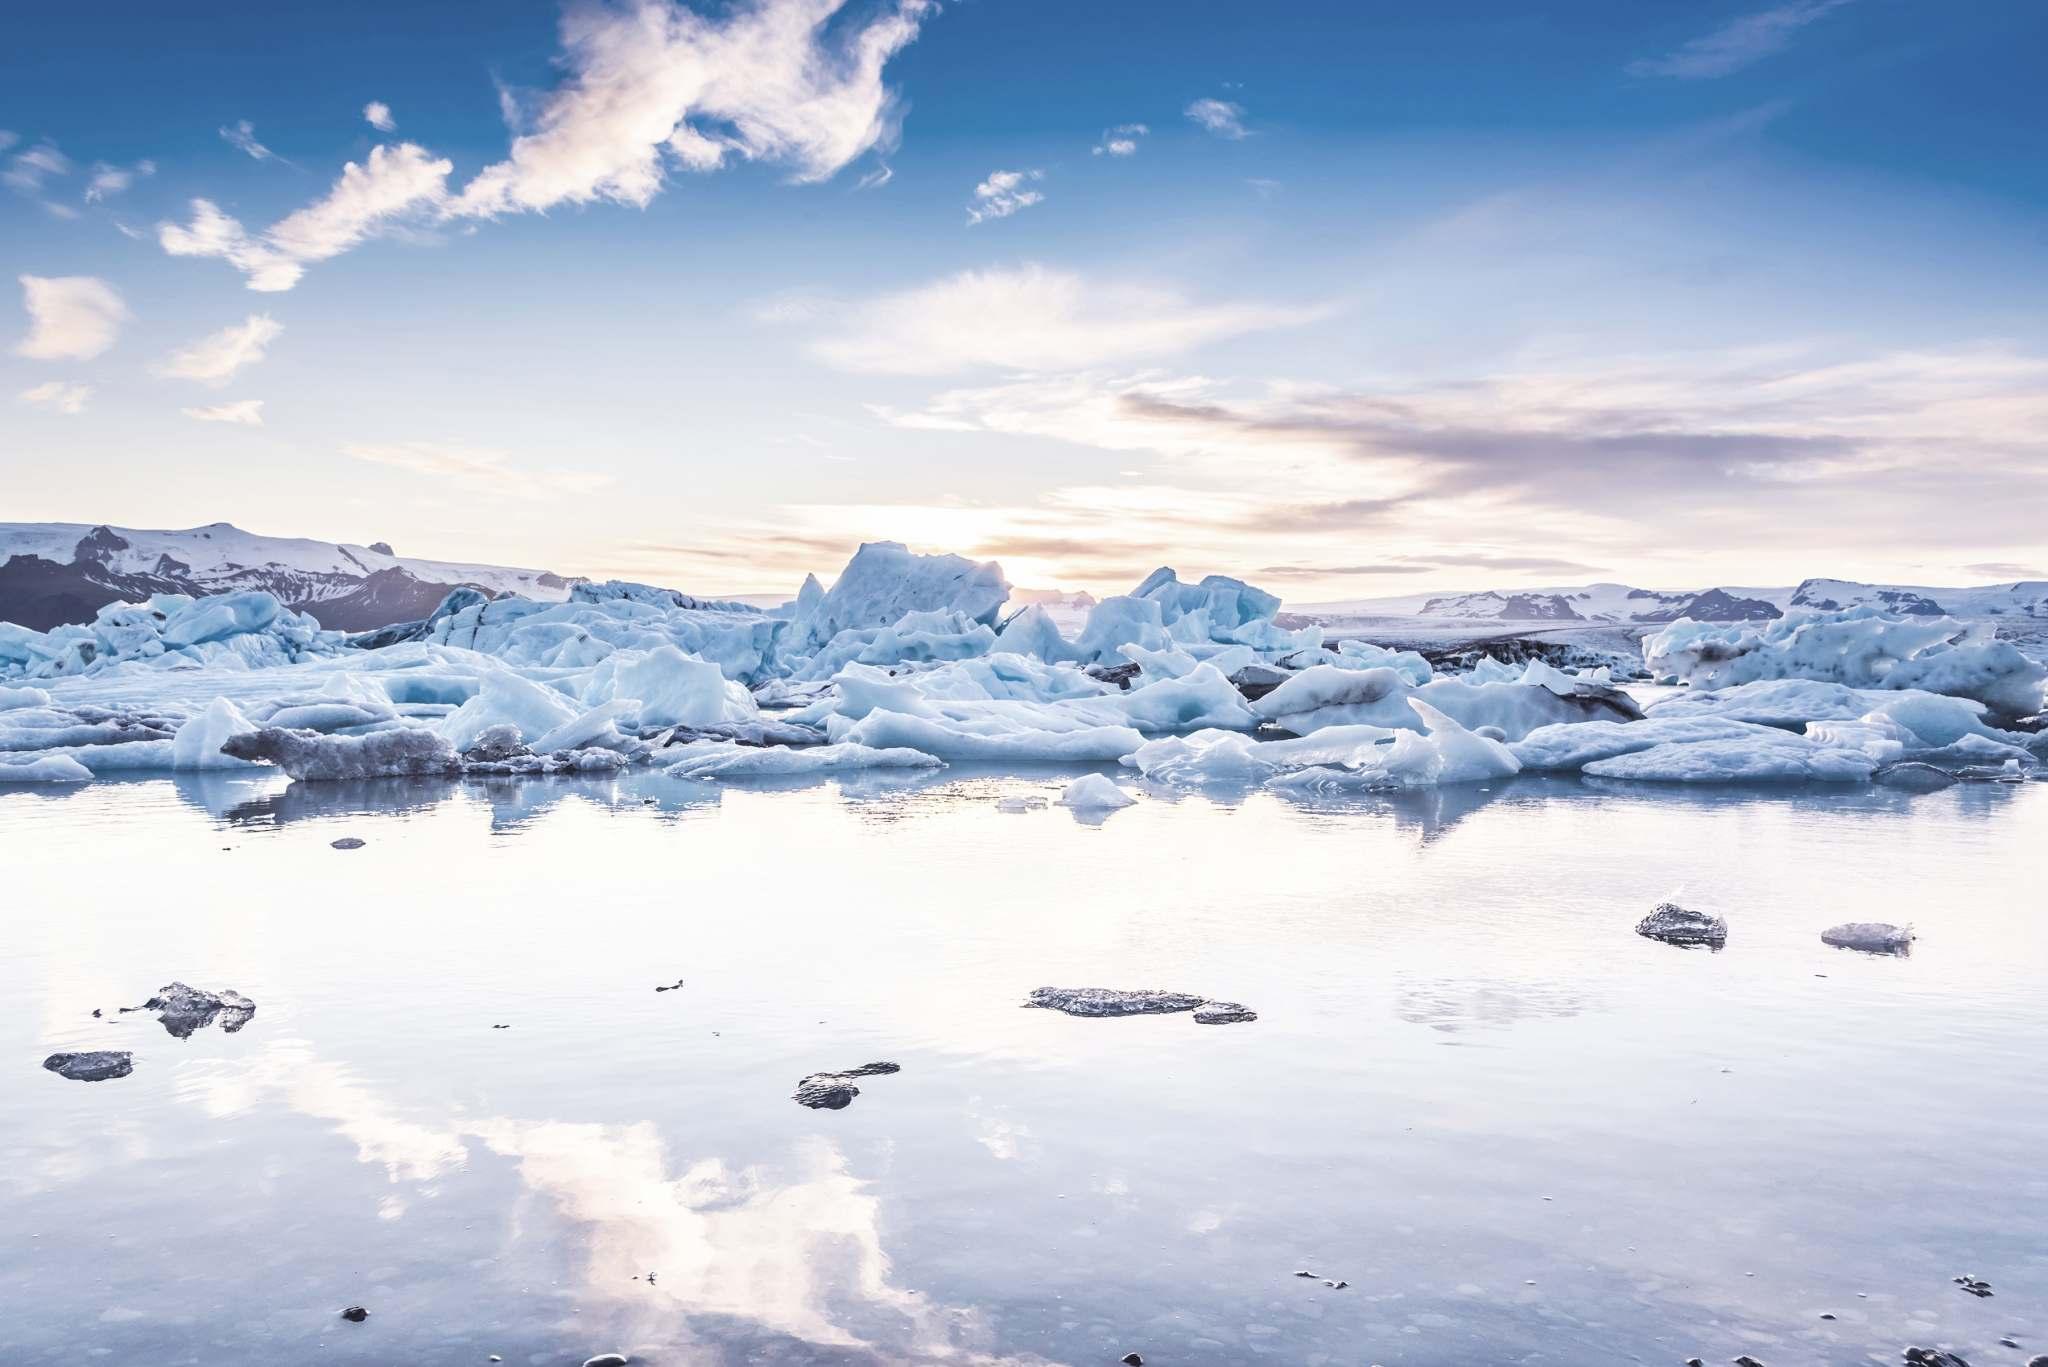 Iceland Jokulsarlon Glacial Lagoon